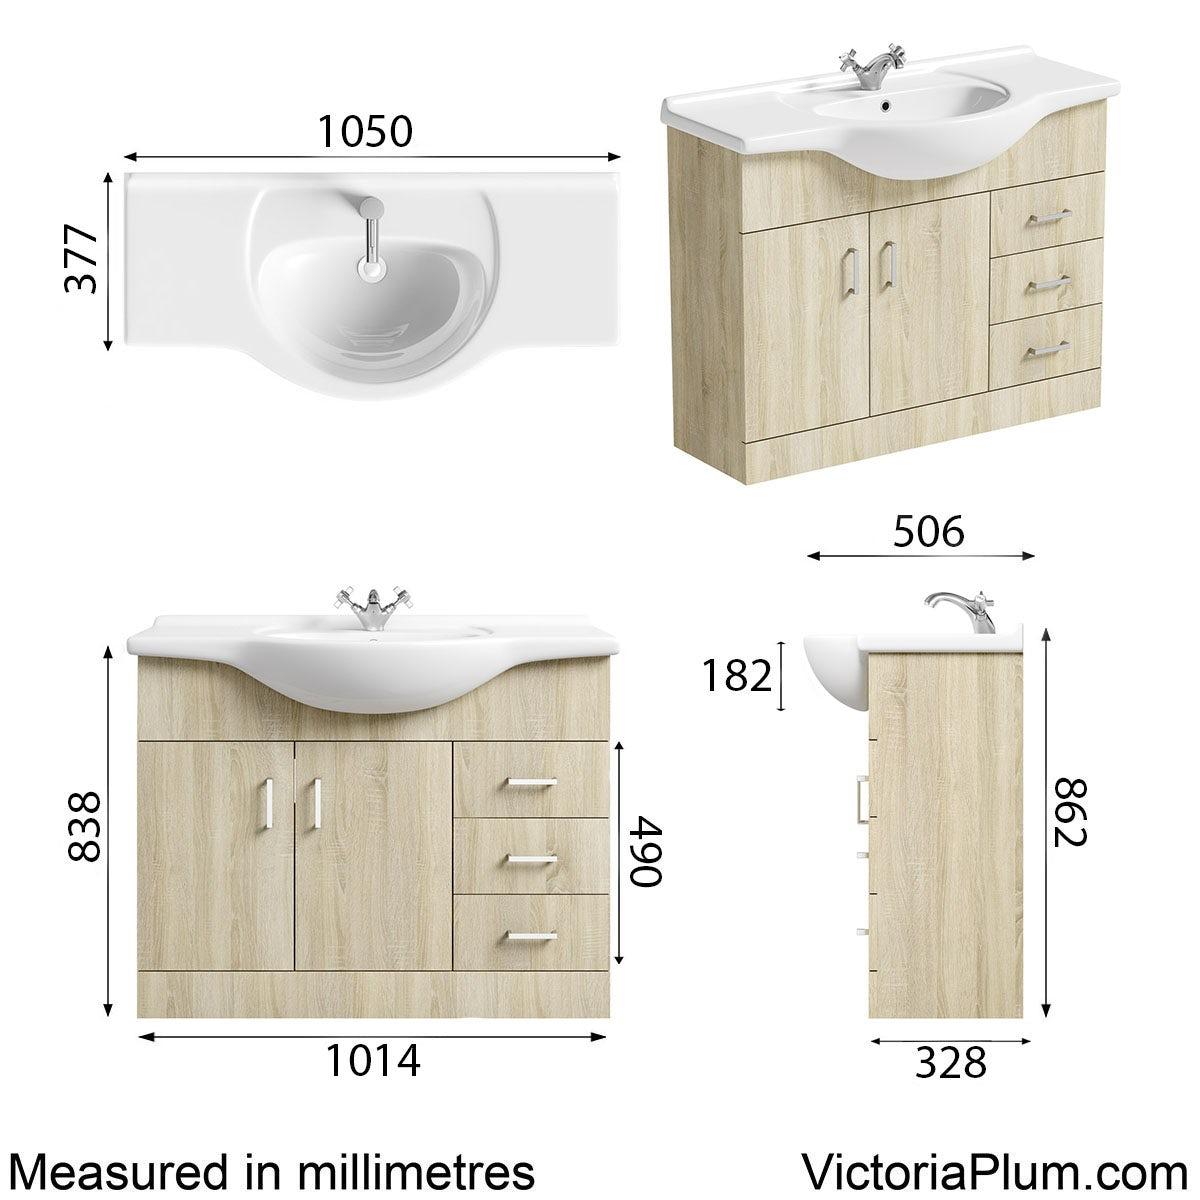 Dimensions for Orchard Eden oak vanity unit and basin 1050mm